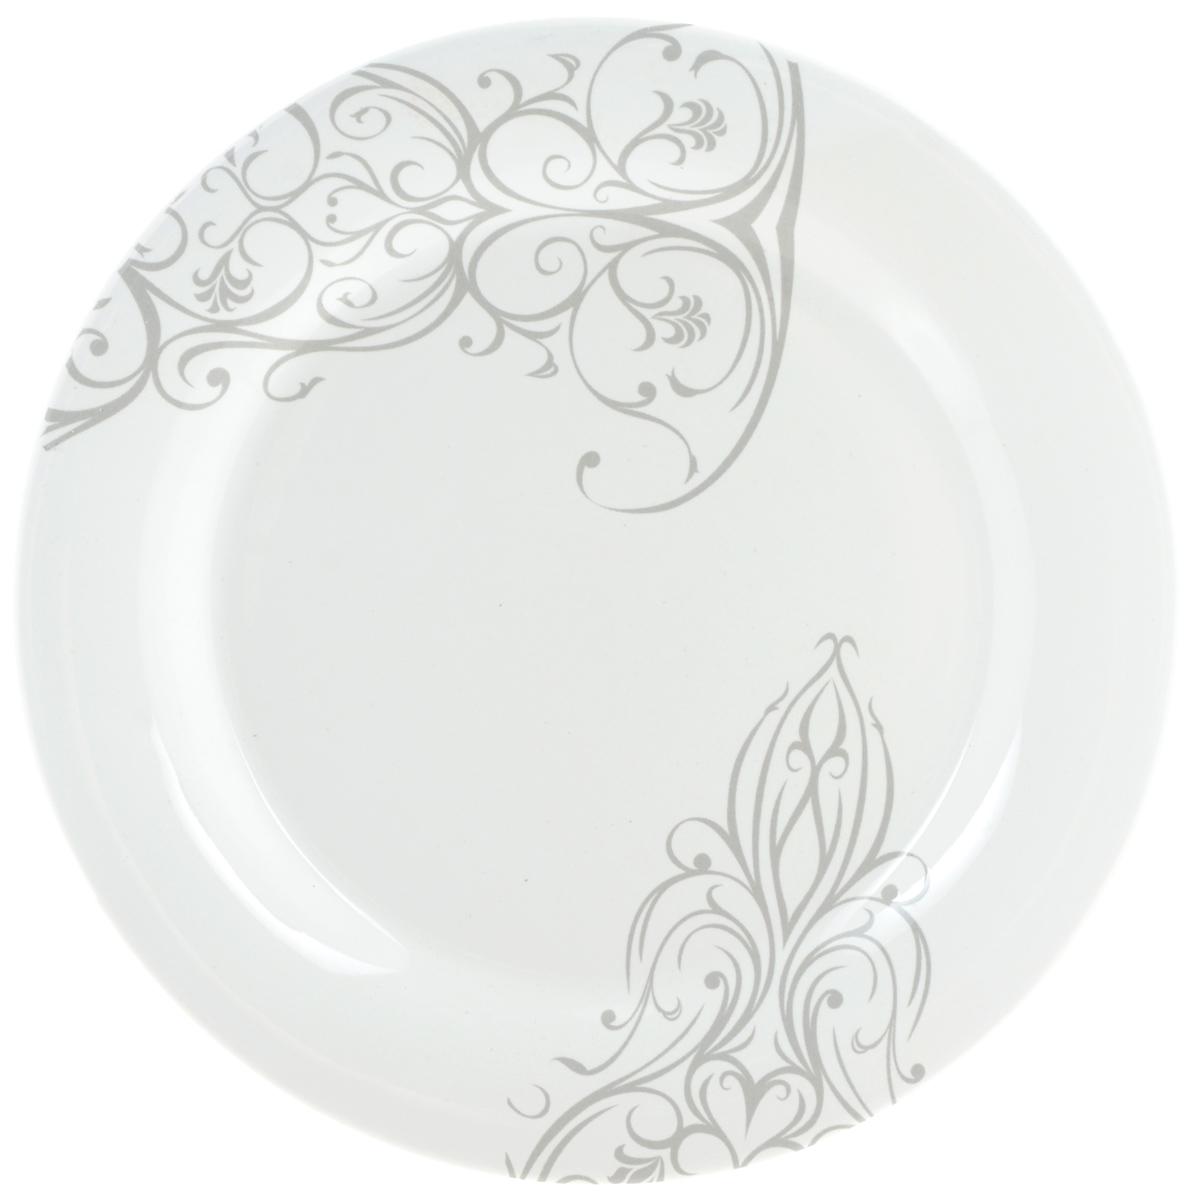 цена на Тарелка десертная Ceramiche Viva Черный ирис, диаметр 20 см